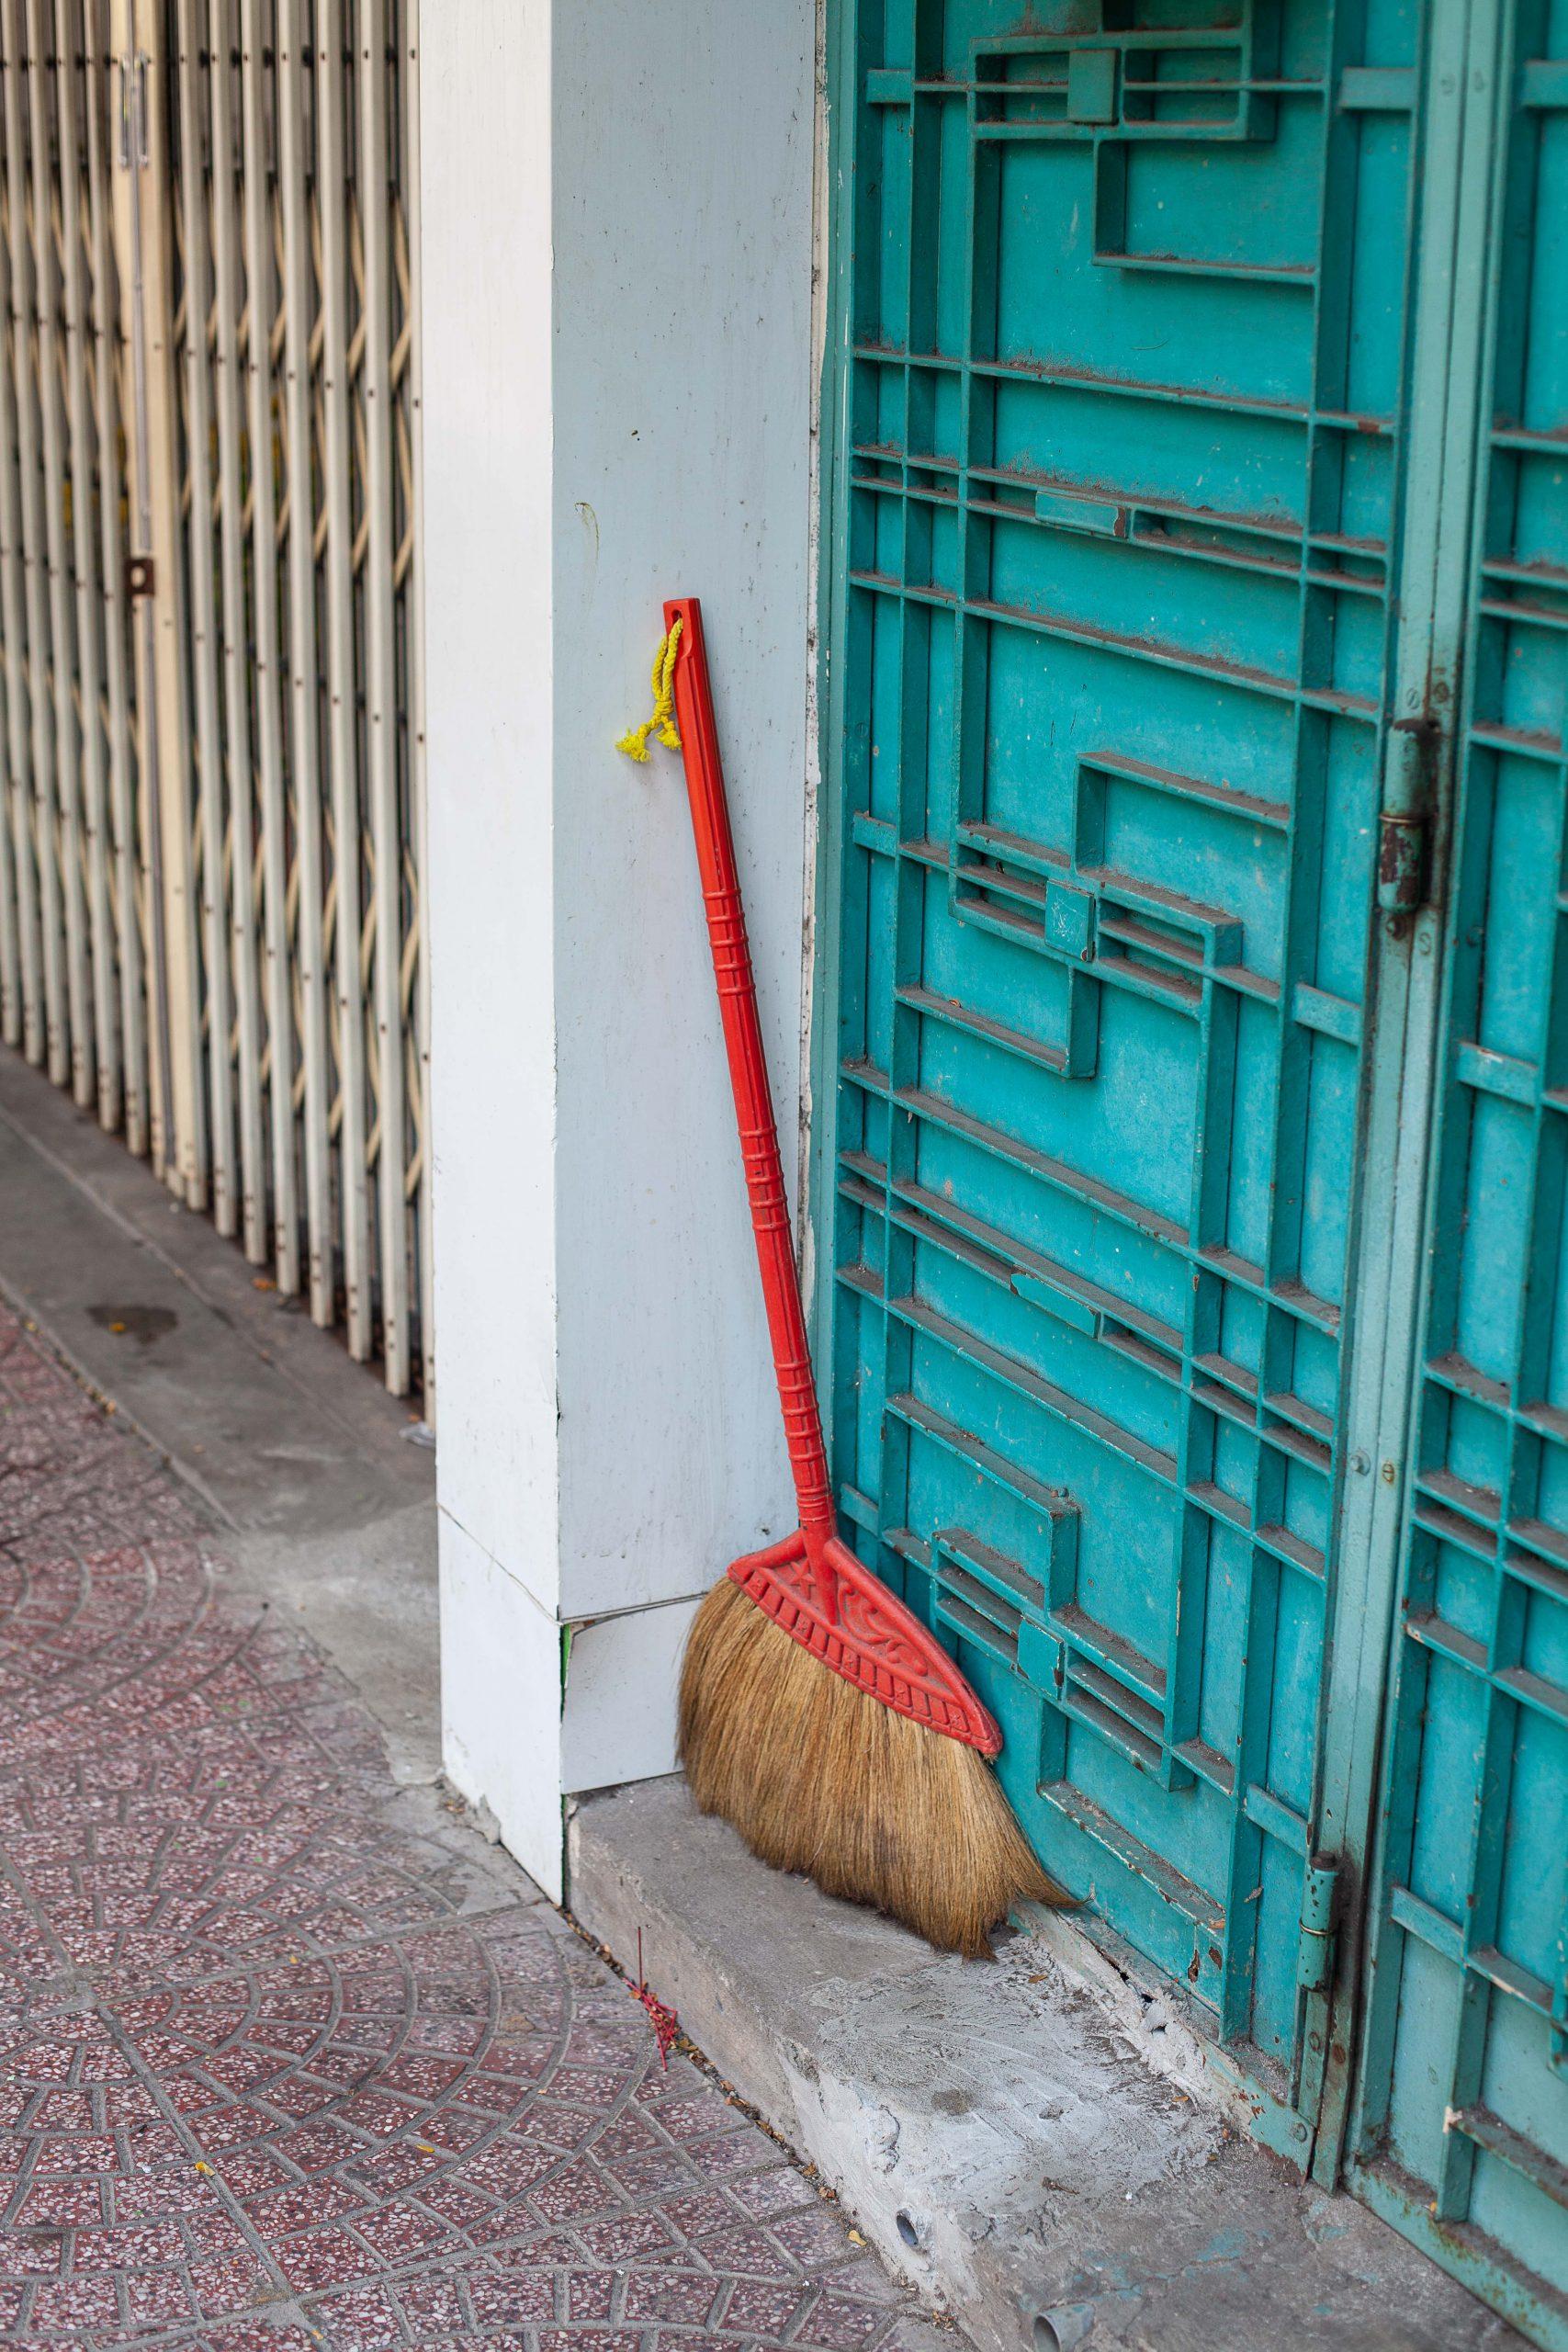 Broomstick-compositions-vietnam-40-of-40